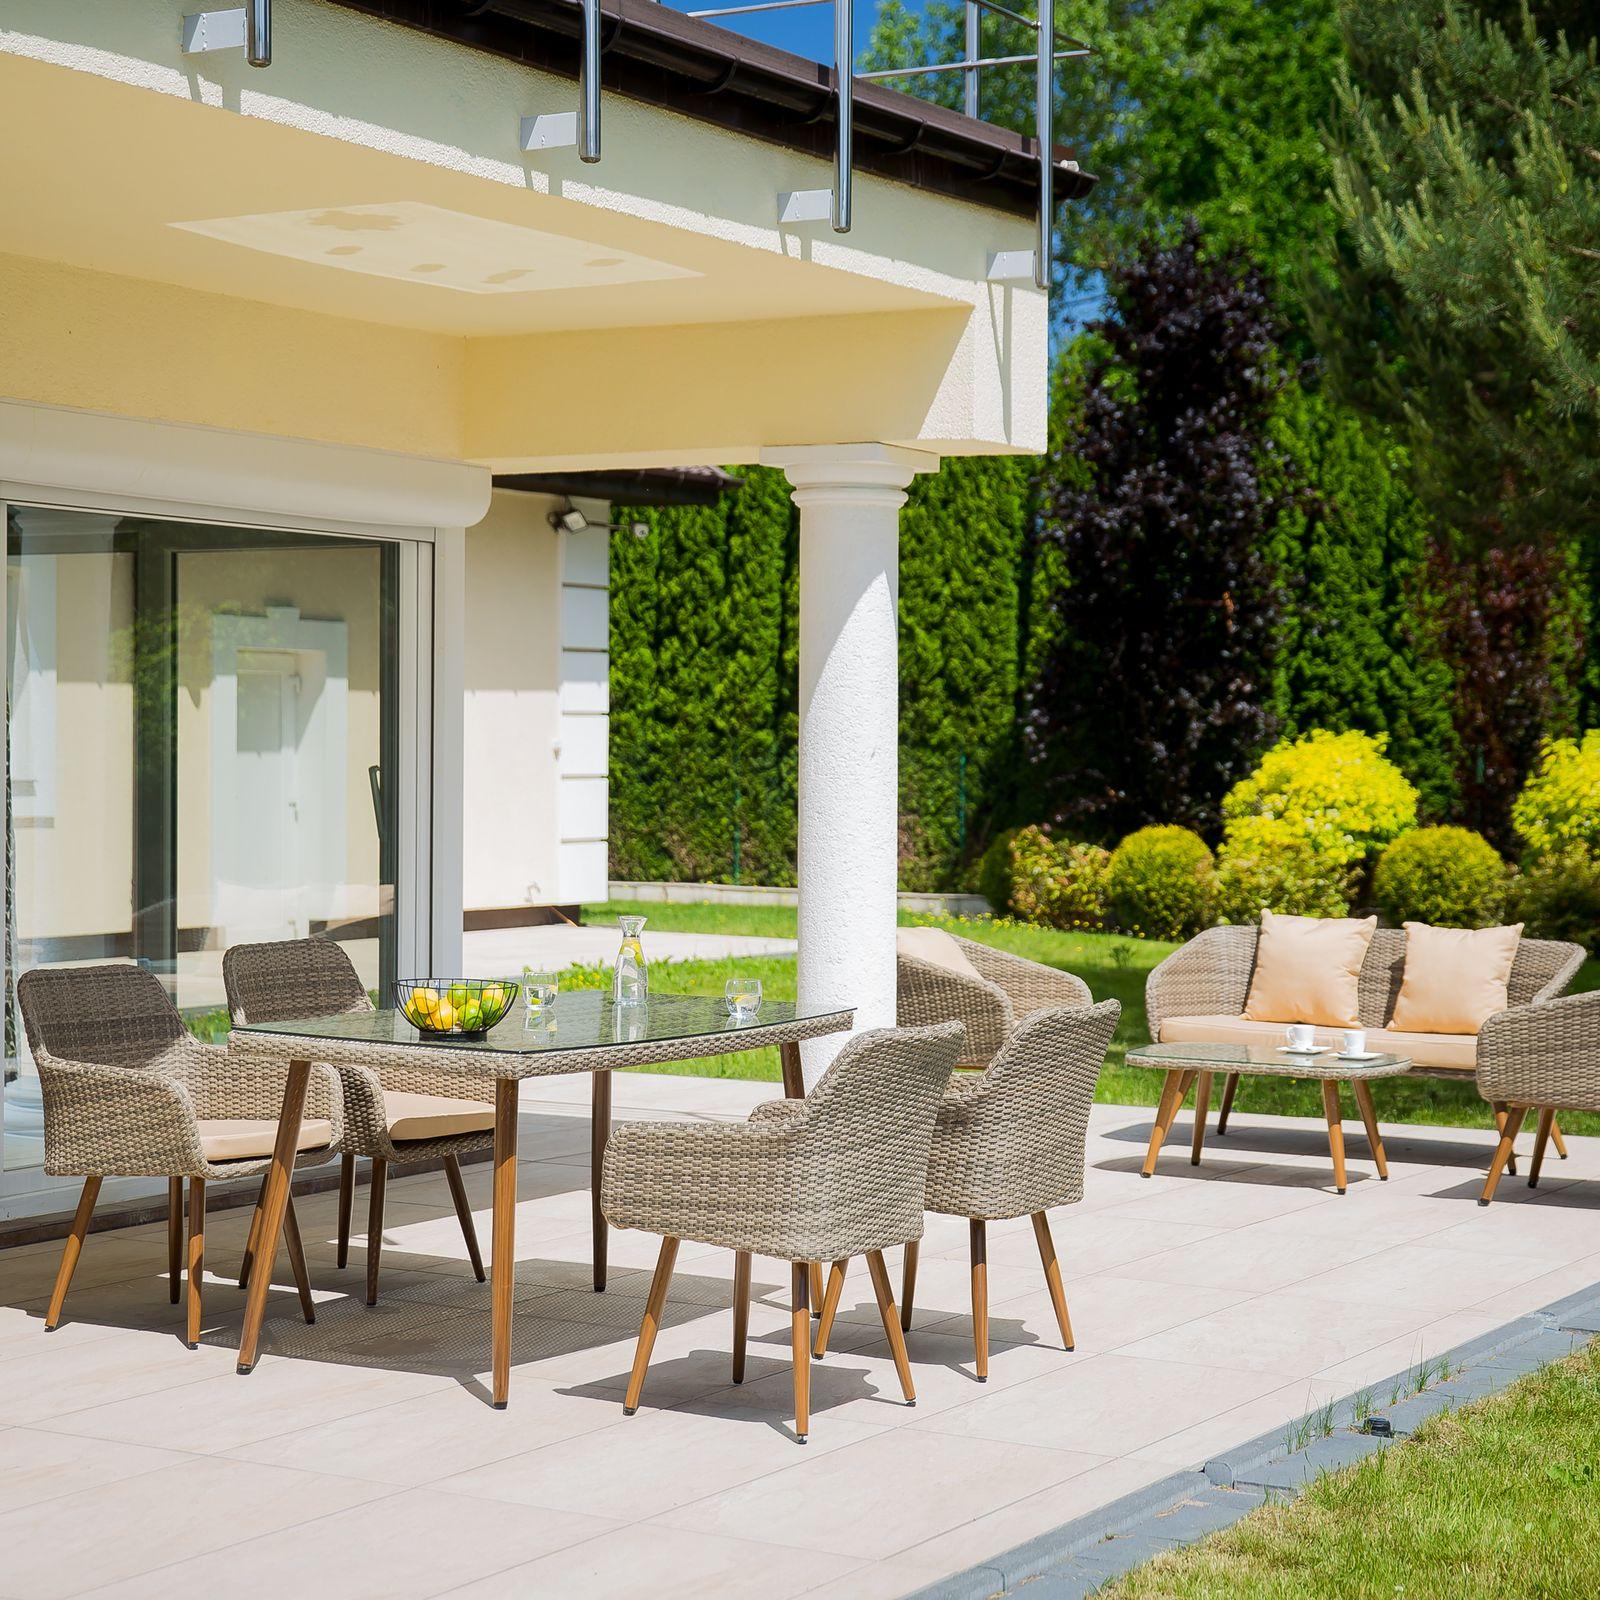 Set de muebles 1 mesa + 4 sillas Marlene gris PATIO